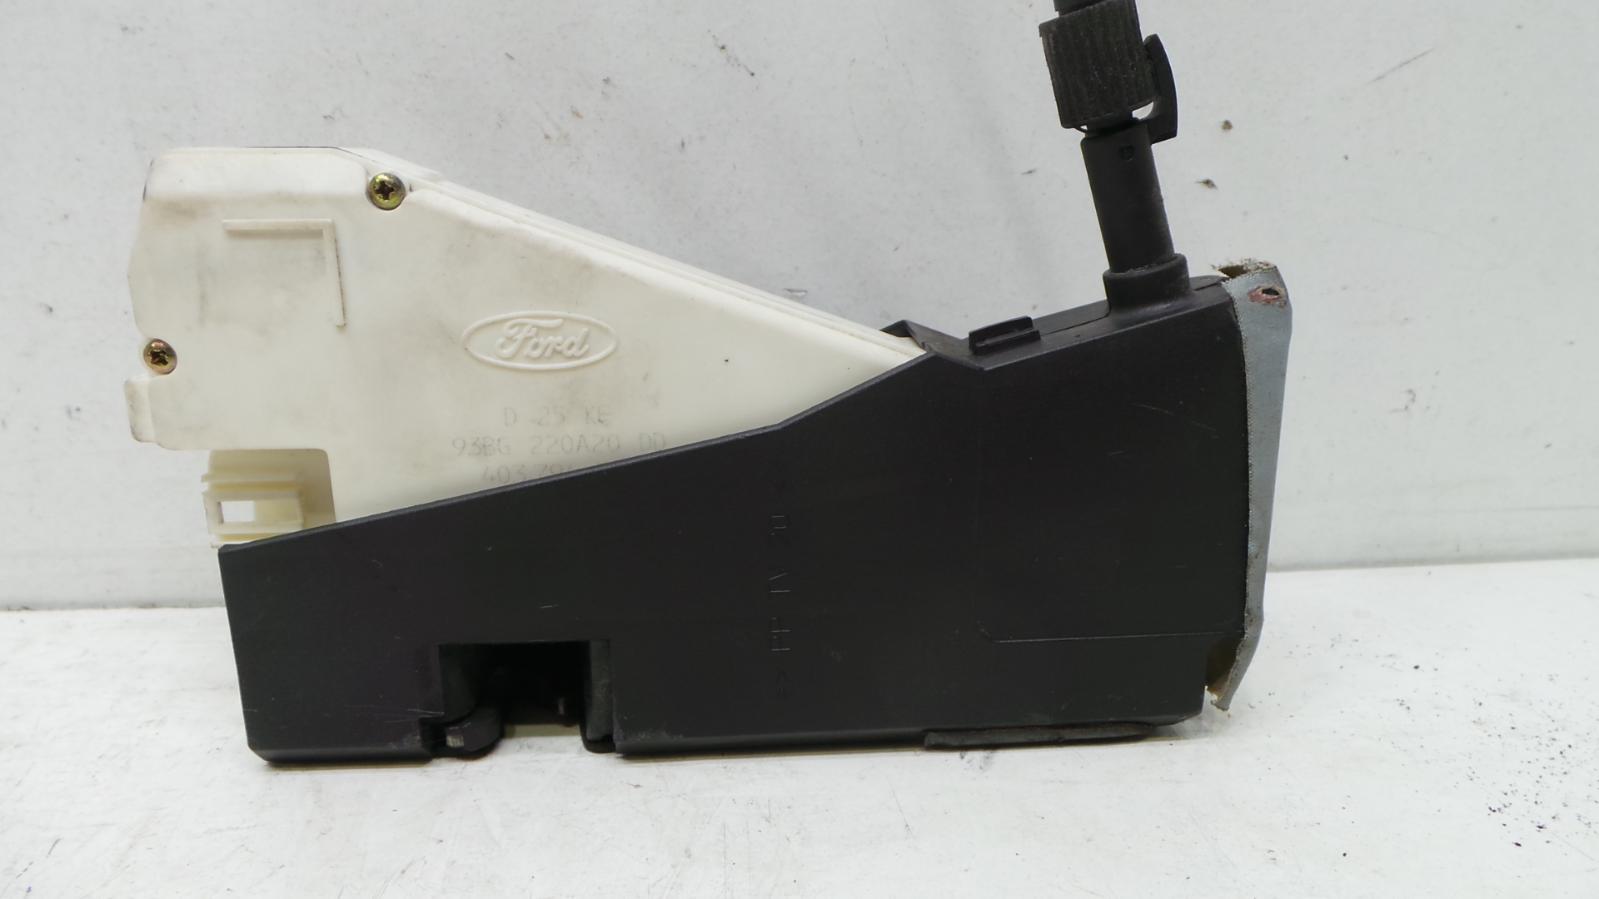 2004 Seat Alhambra Mk1 Face Lift Door Lock Mechanism 93bg